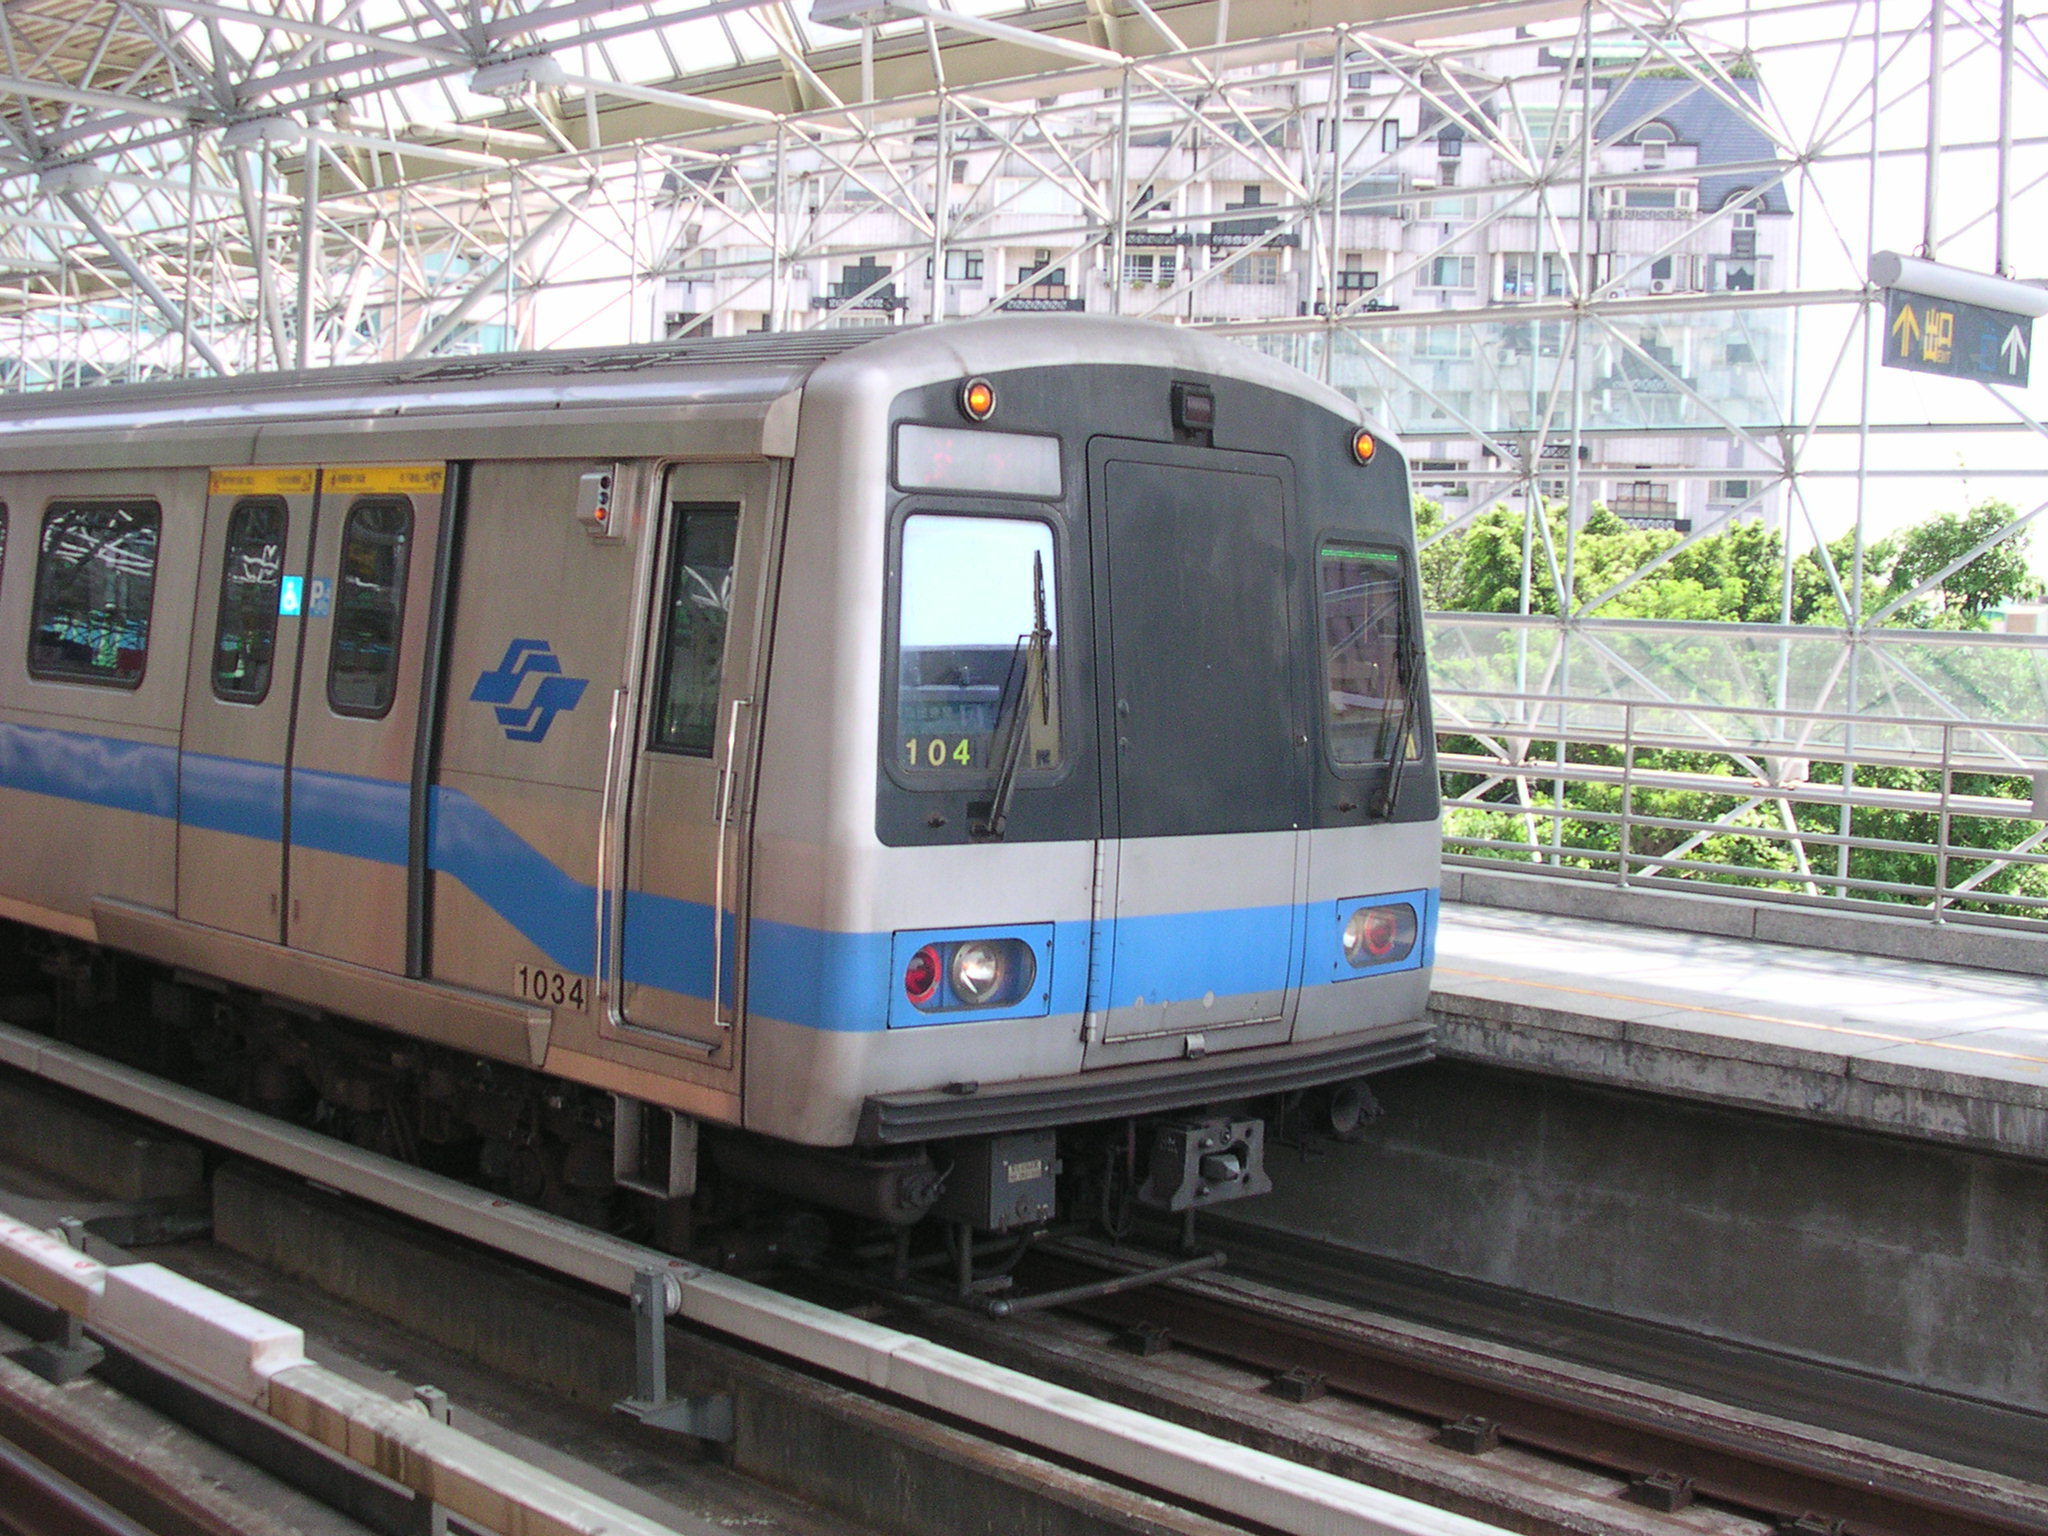 File:Taipei MRT Train C301 No 1034.JPG